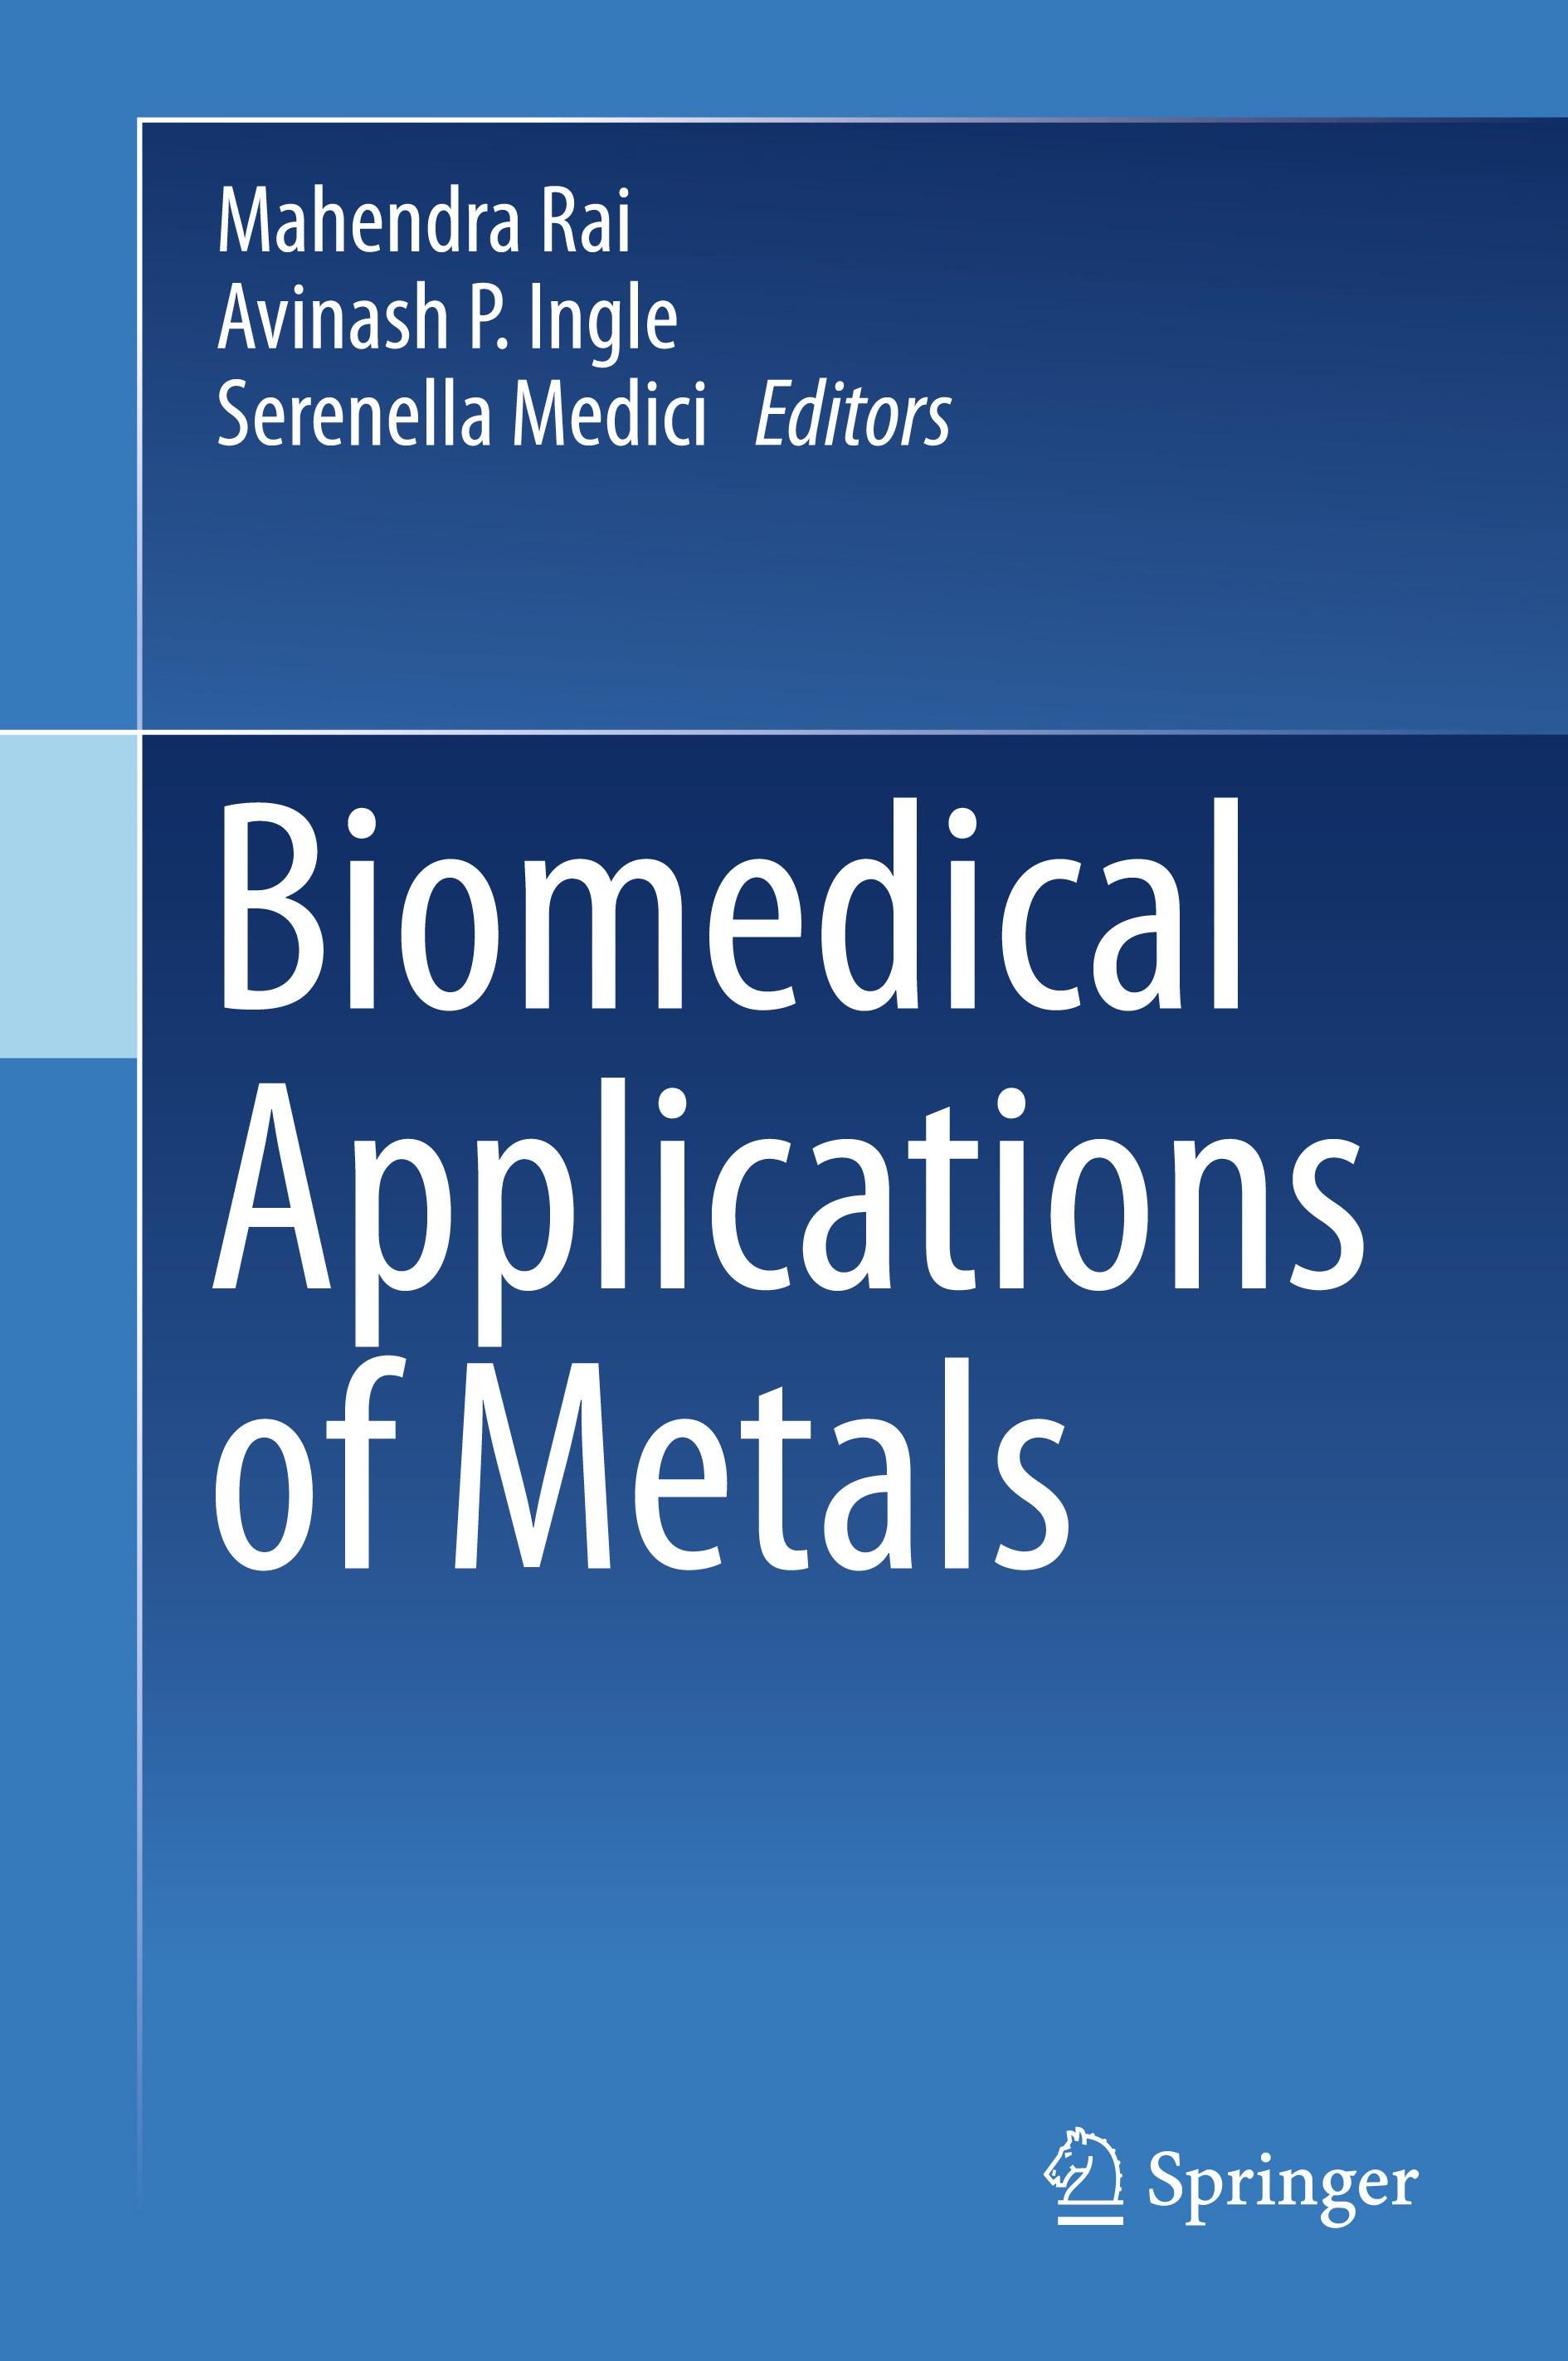 Ingle, Avinash P. - Biomedical Applications of Metals, ebook